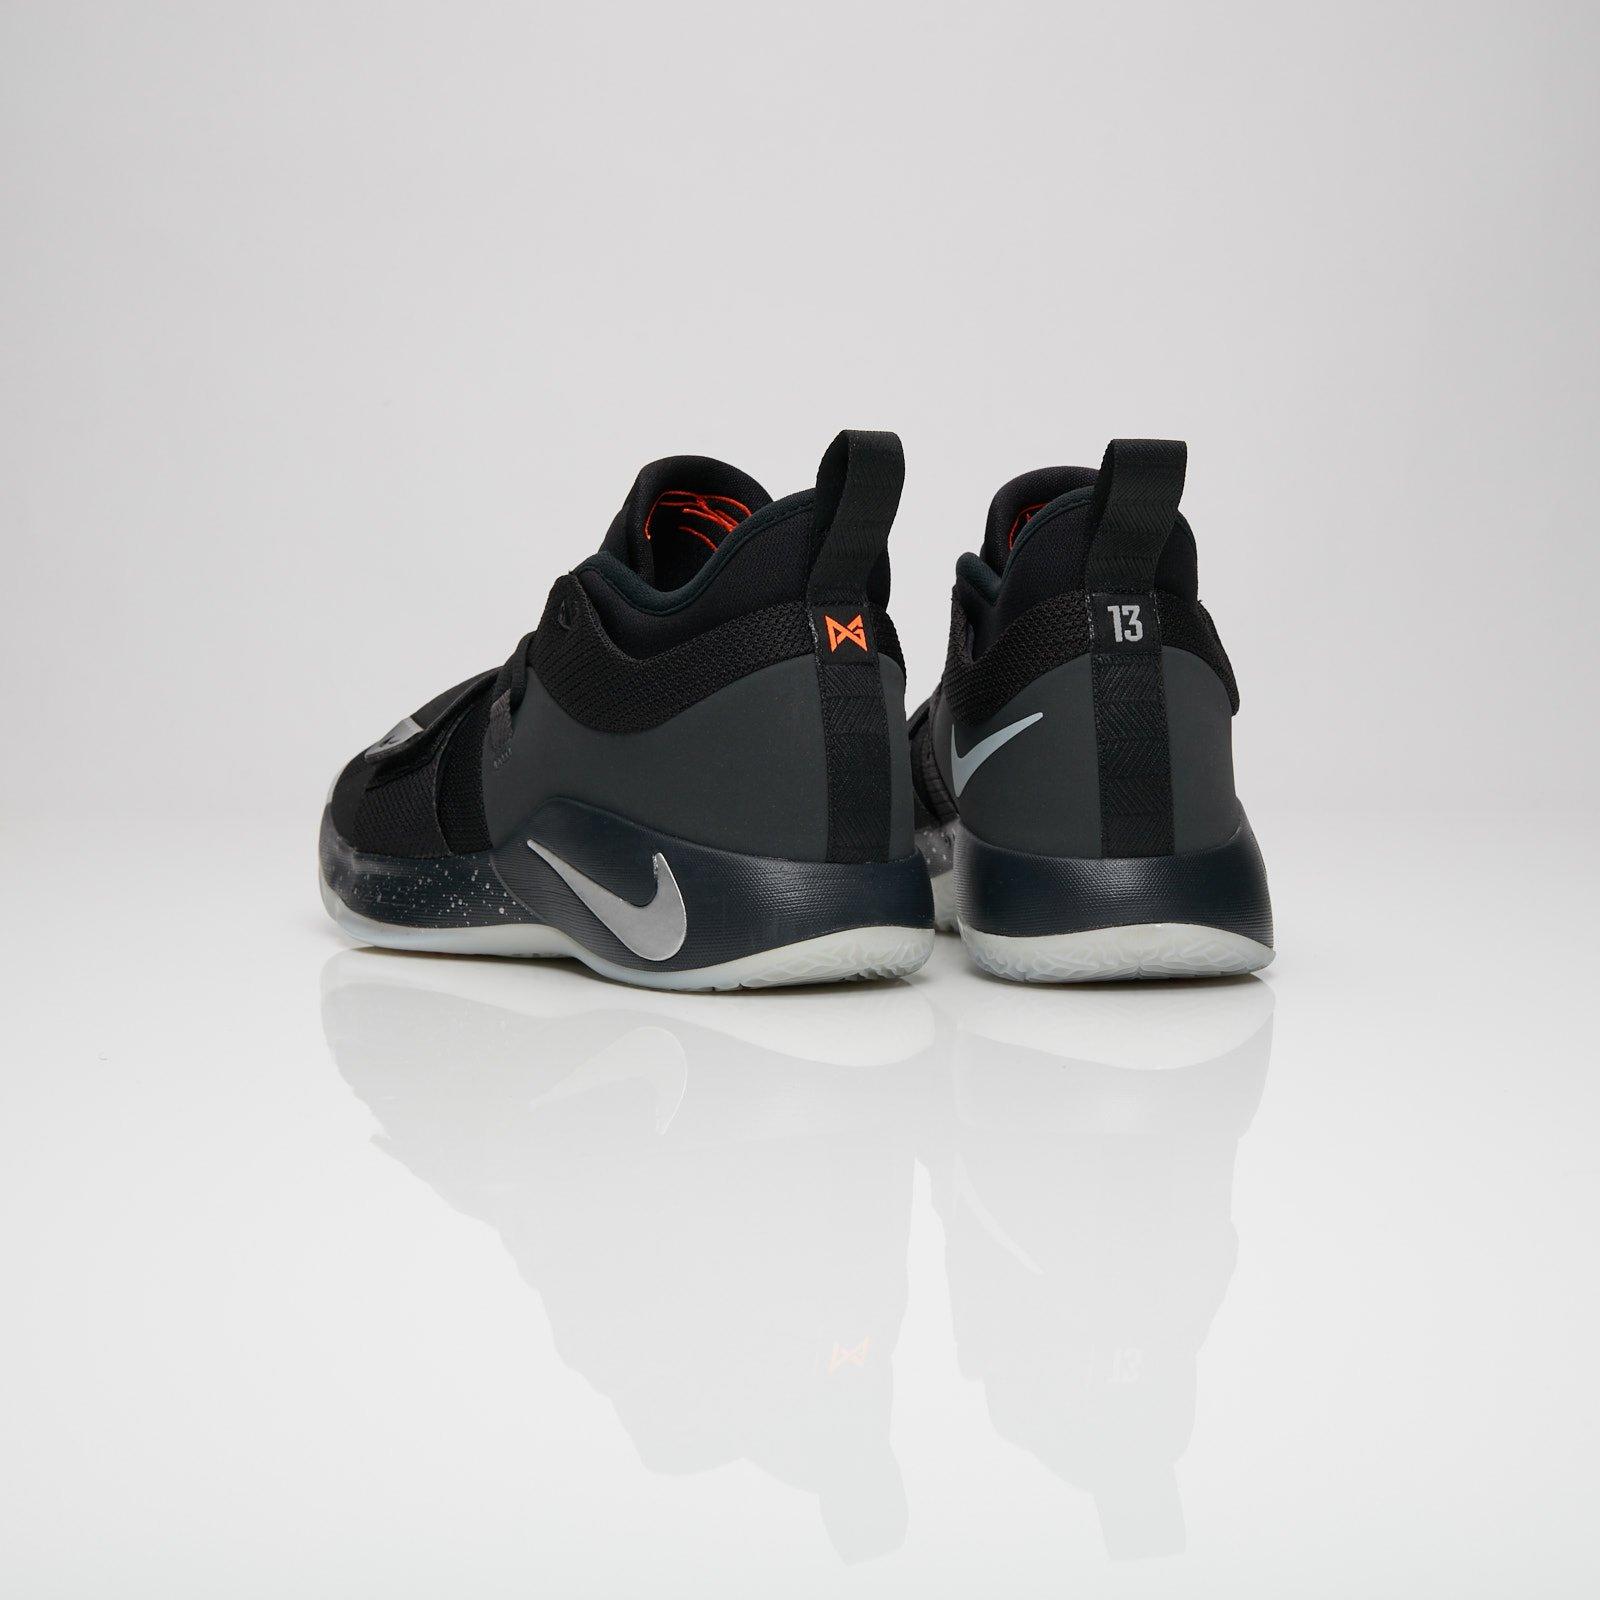 daf28da225782d Nike PG 2.5 - Bq8452-004 - Sneakersnstuff